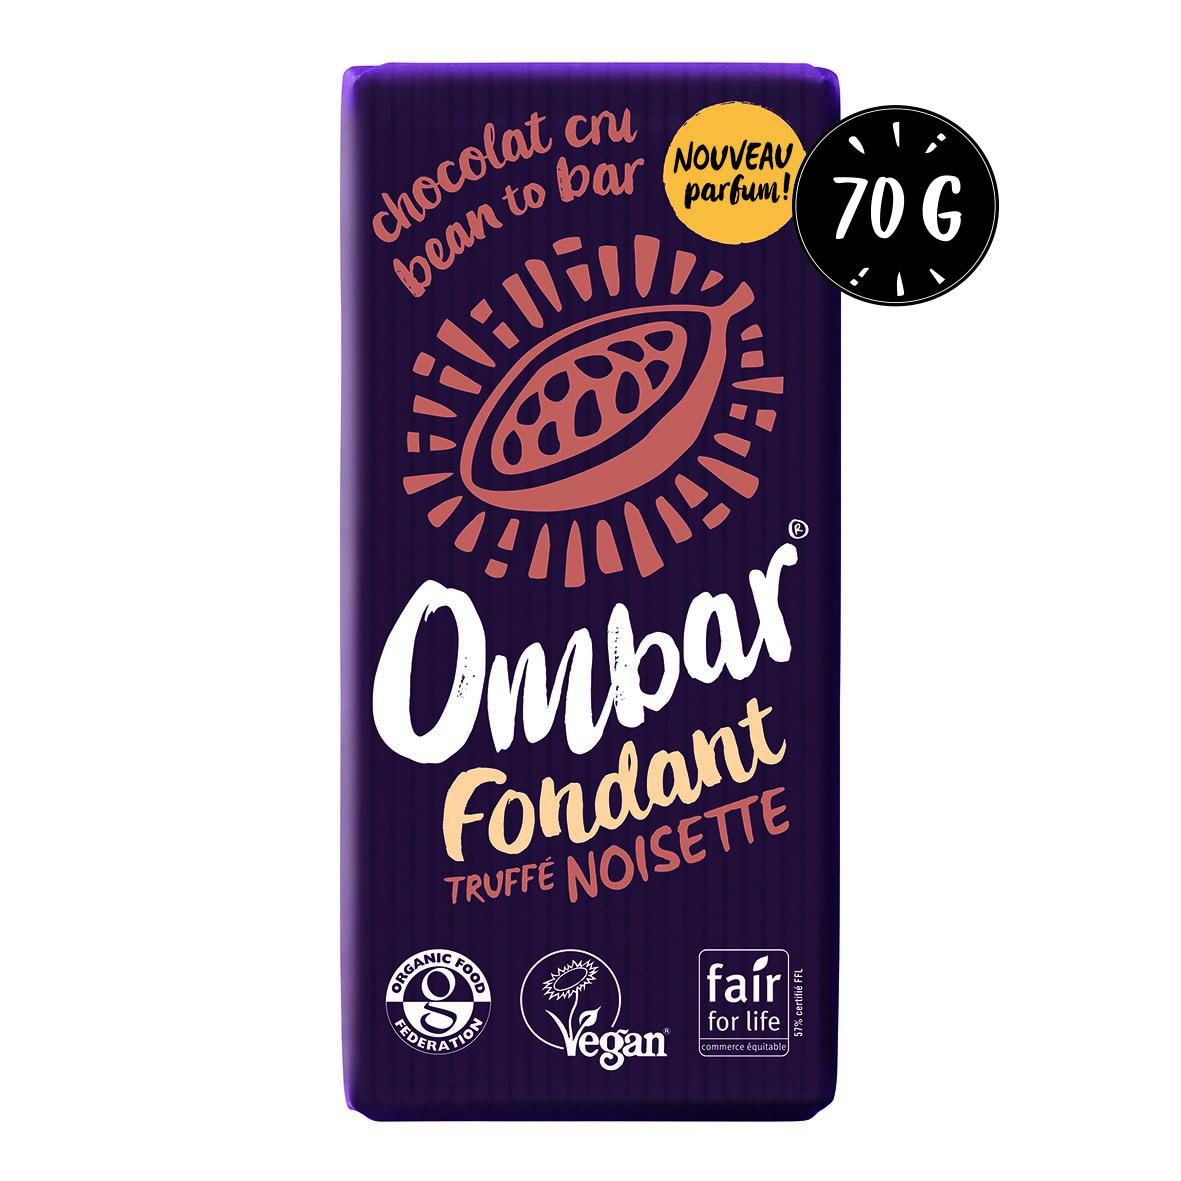 Chocolat CRU Fondant Truffé Noisette 70g